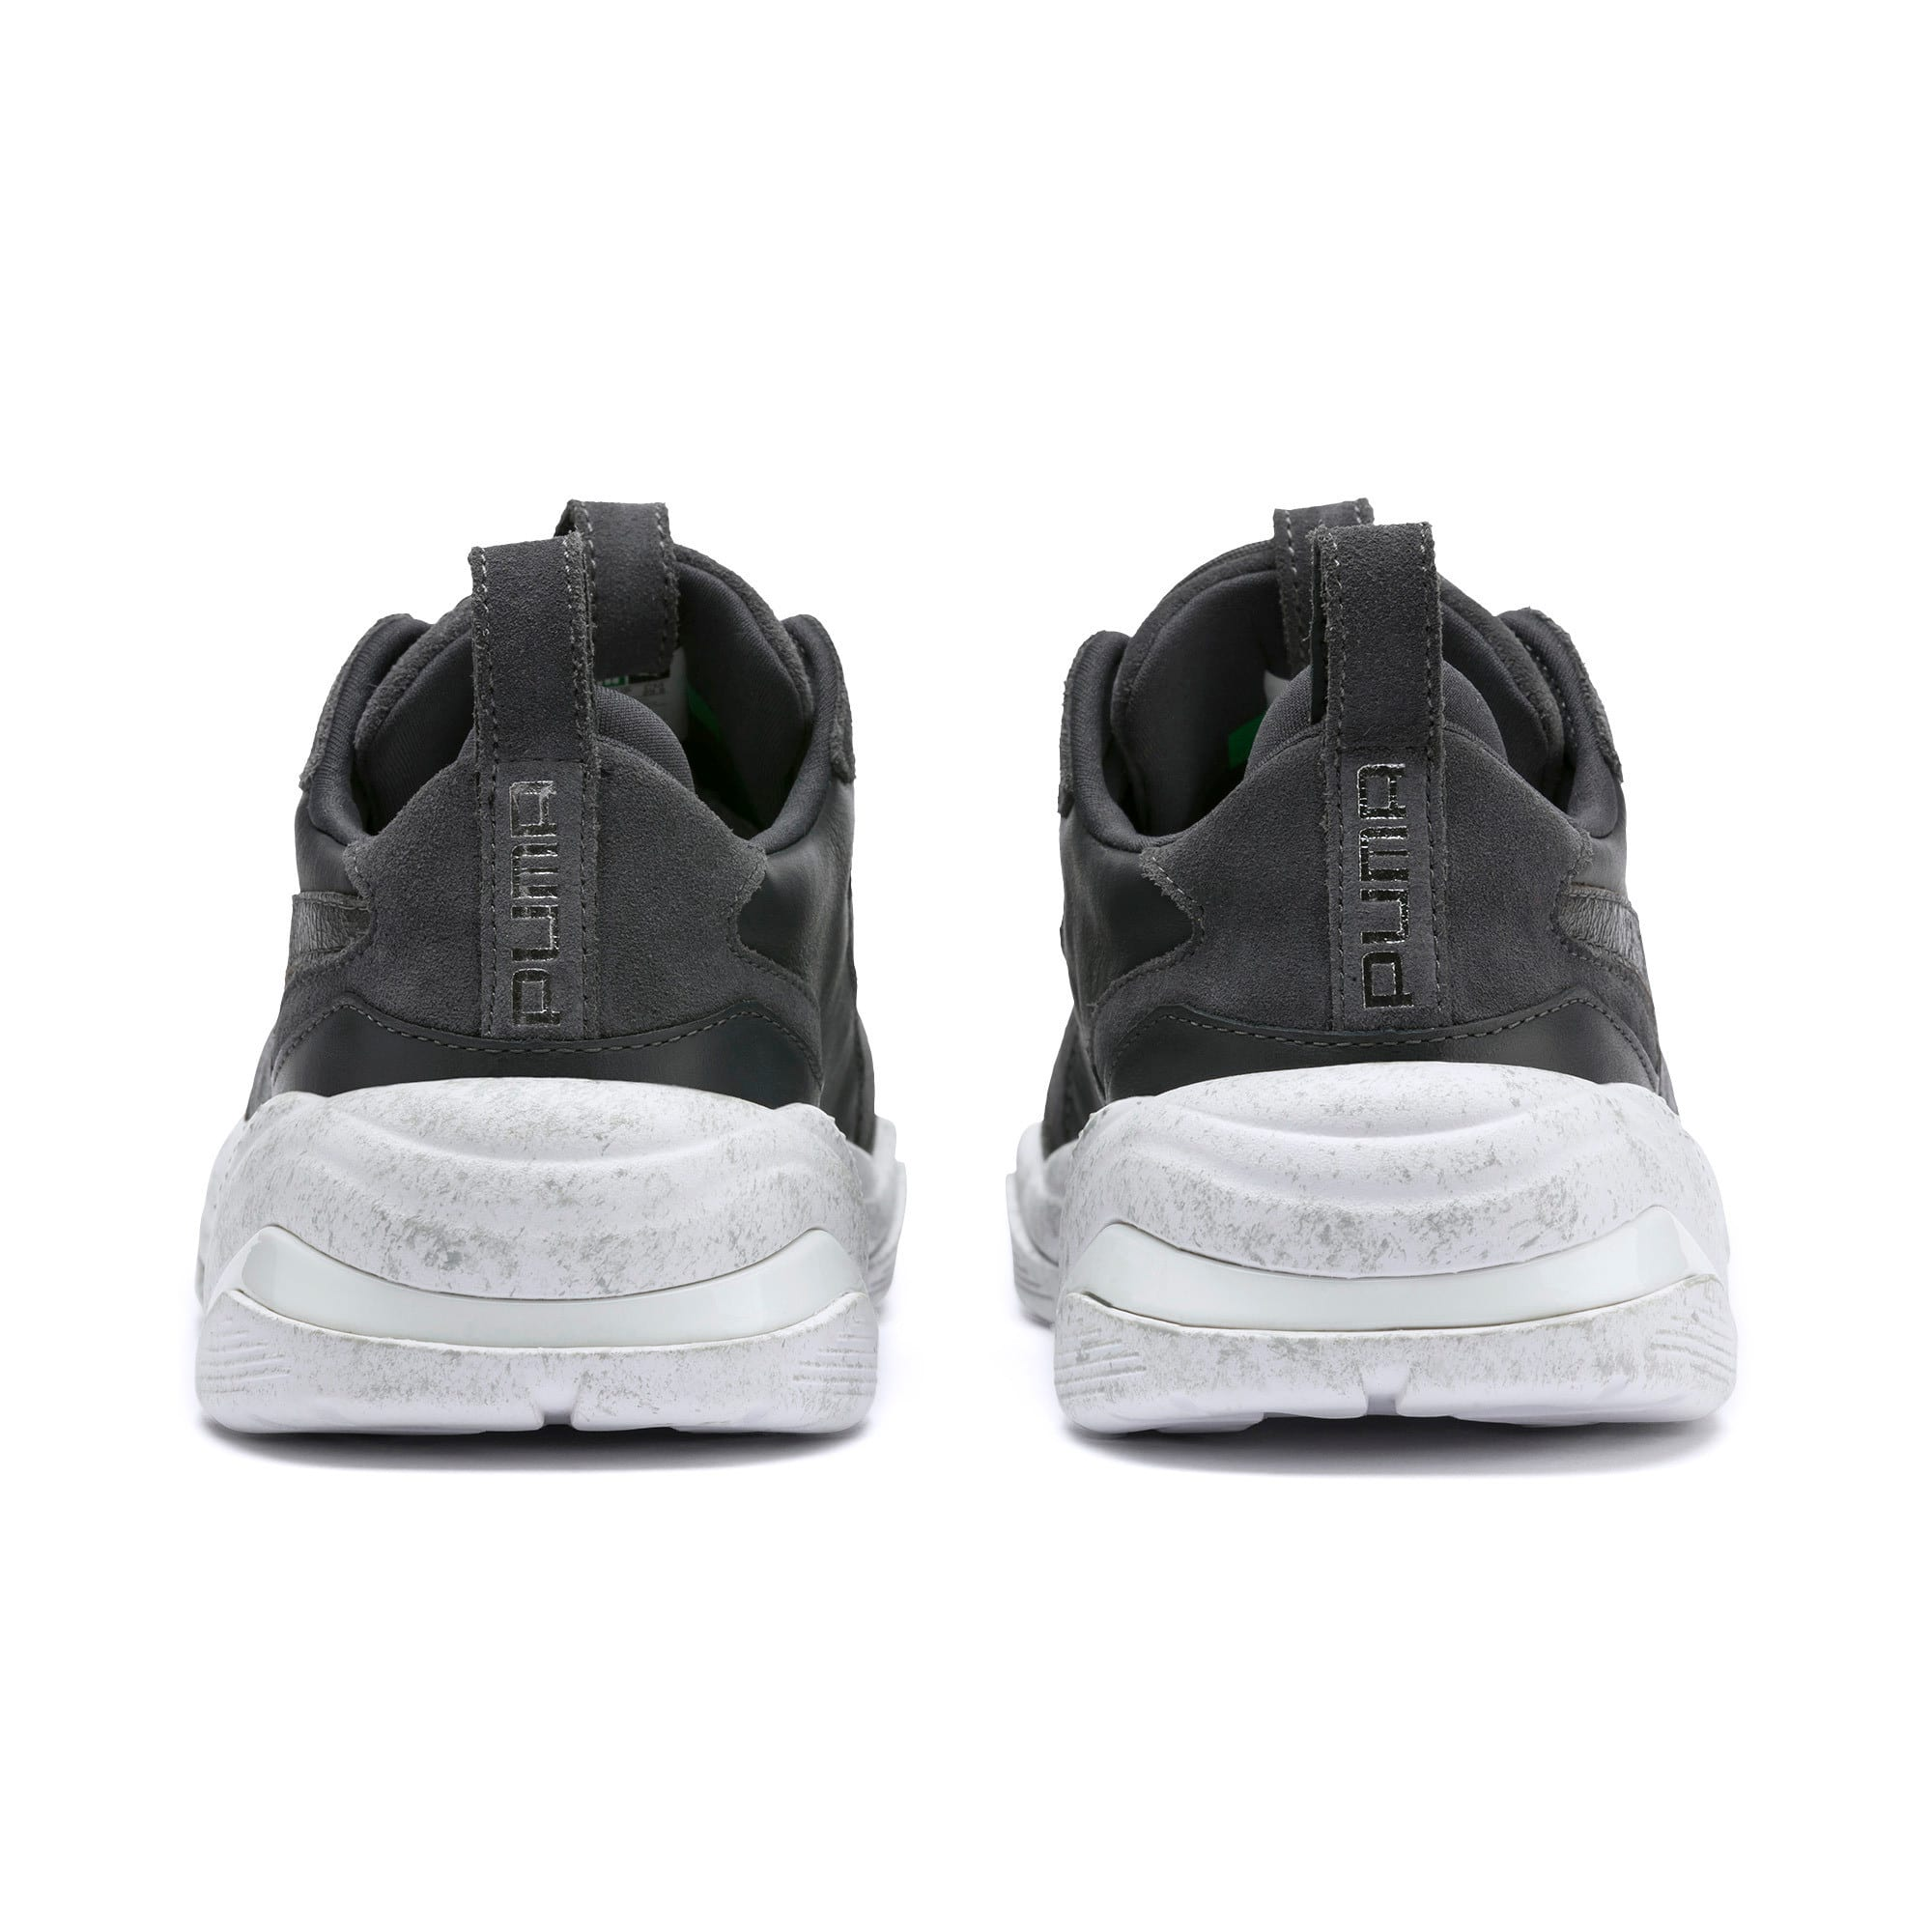 Thumbnail 4 of Thunder Distressed Women's Sneakers, Ebony-Puma Silver, medium